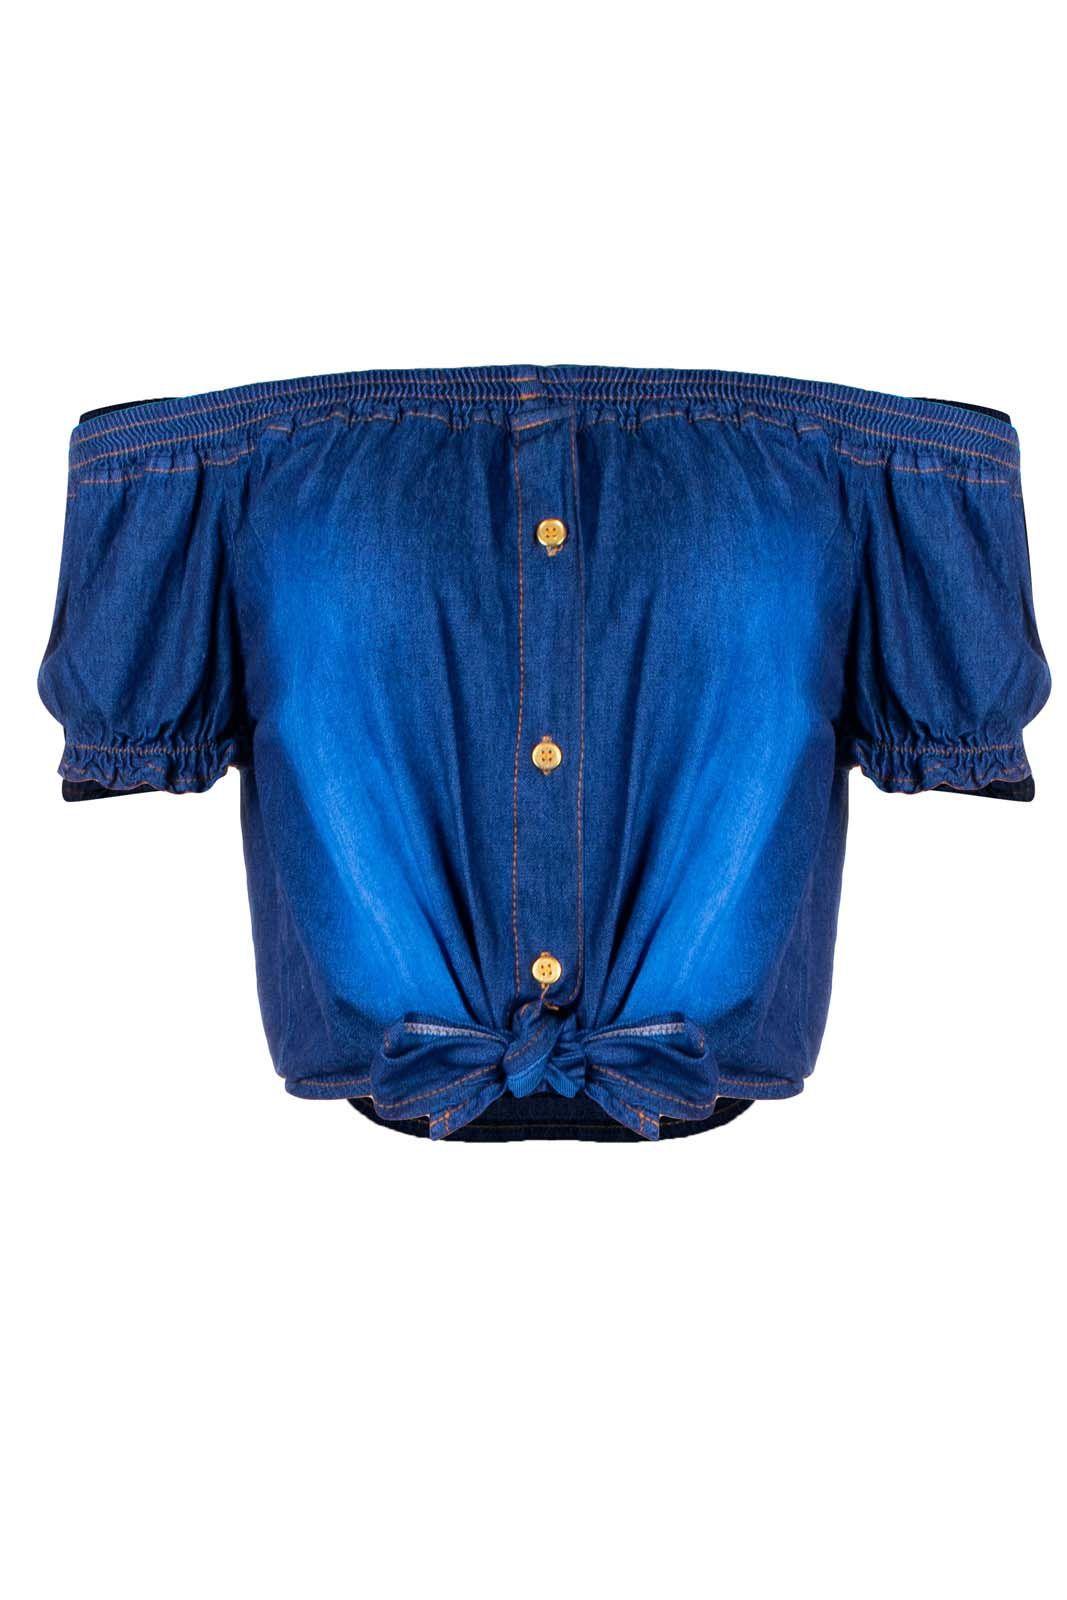 Top Outlet Dri Cropped Jeans Ciganinha 3 Botões Nó Frontal Azul